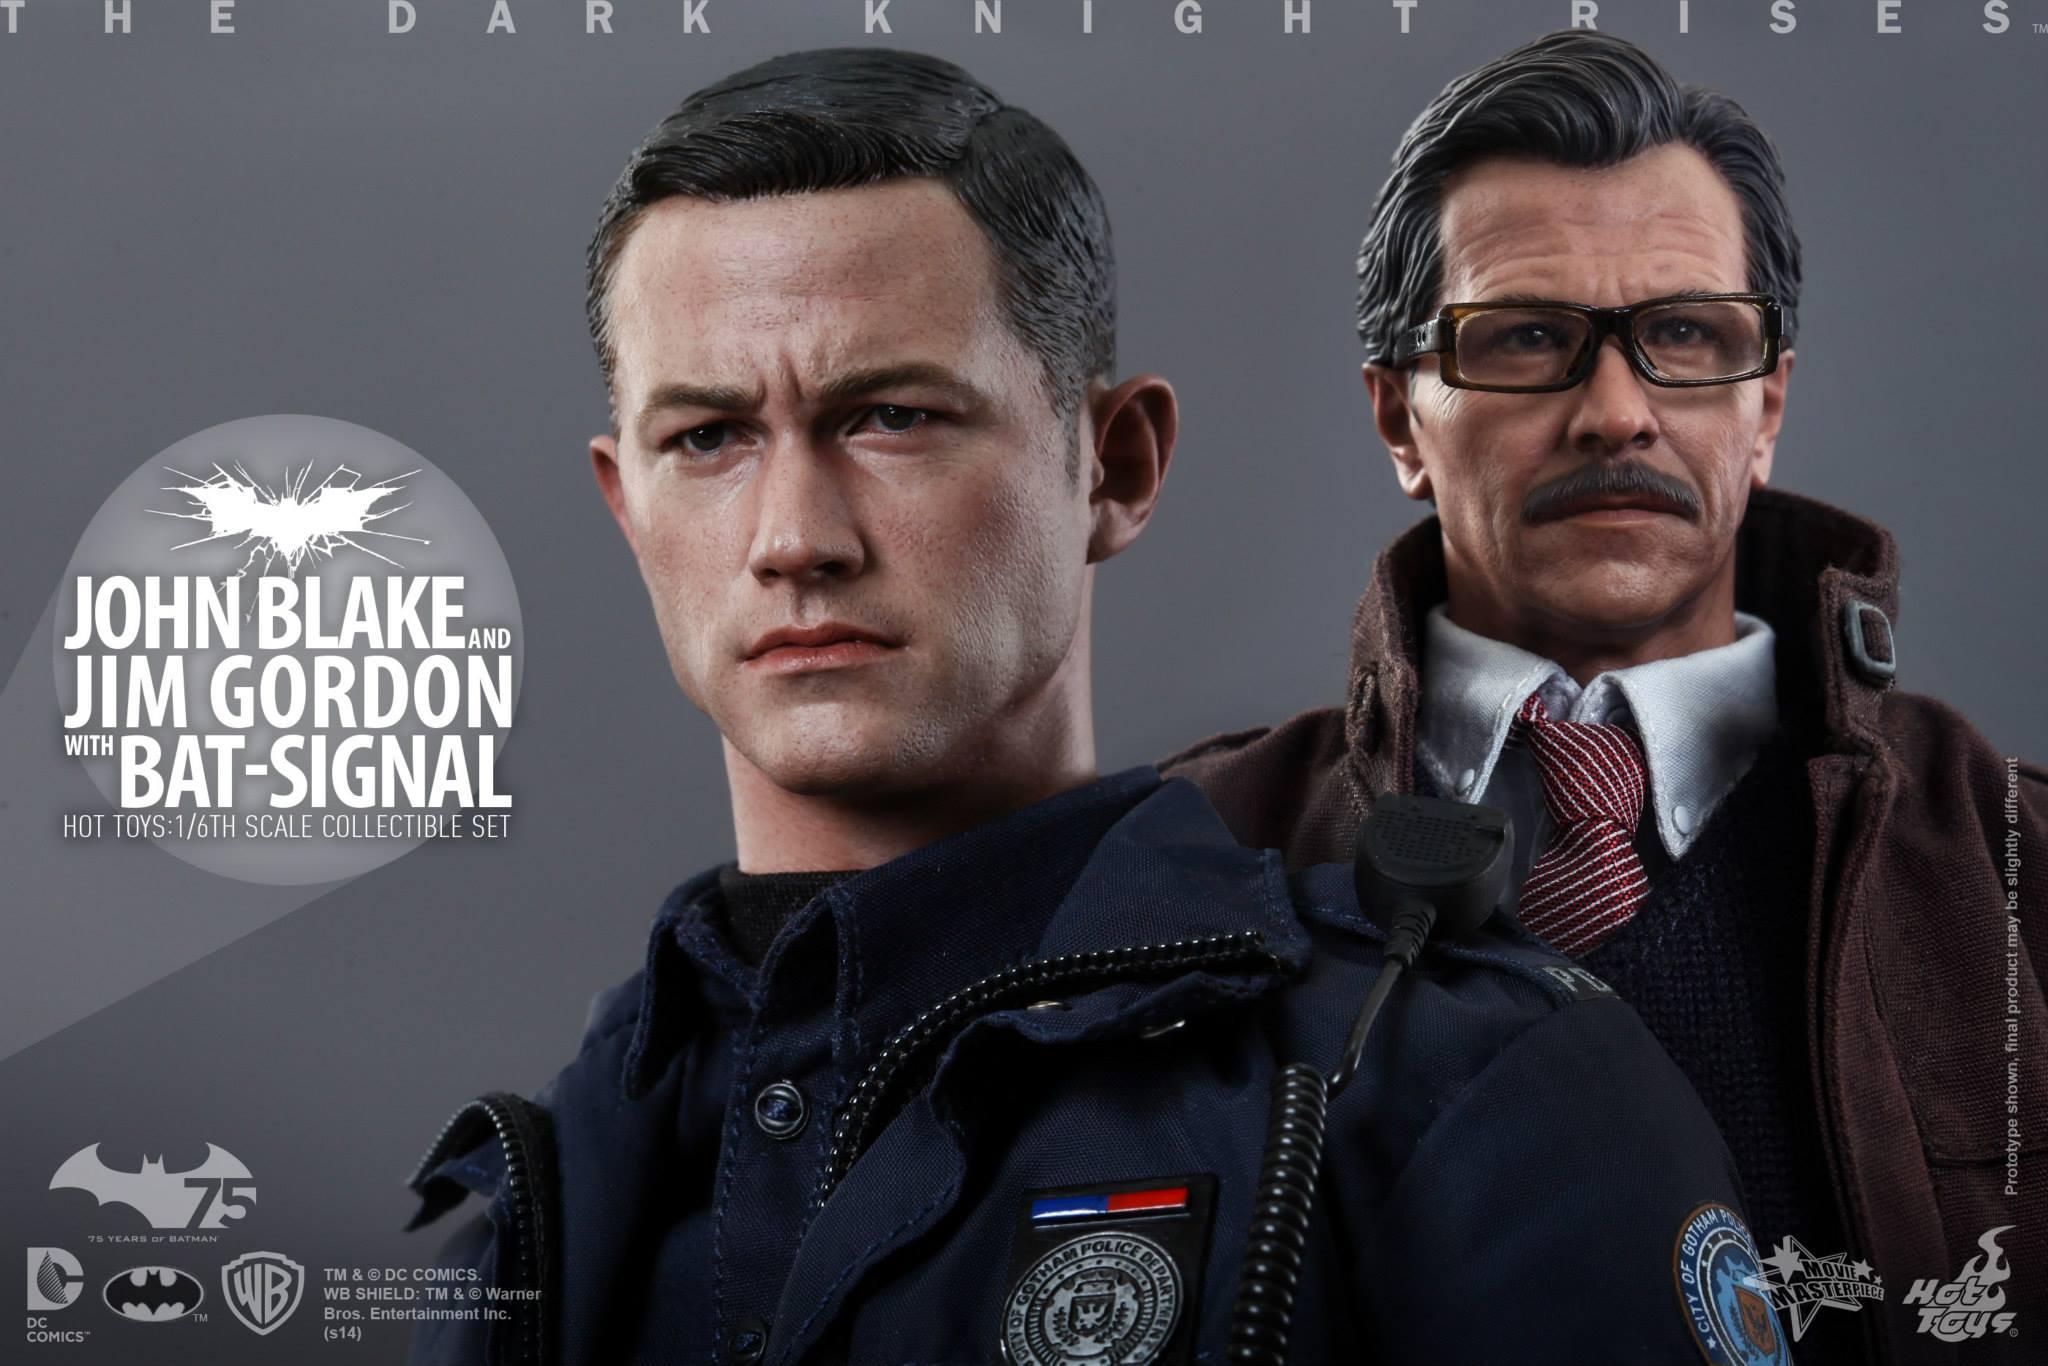 THE DARK KNIGHT RISES - Lt. JIM GORDON & JOHN BLAKE w/BATSIGNAL 608508108